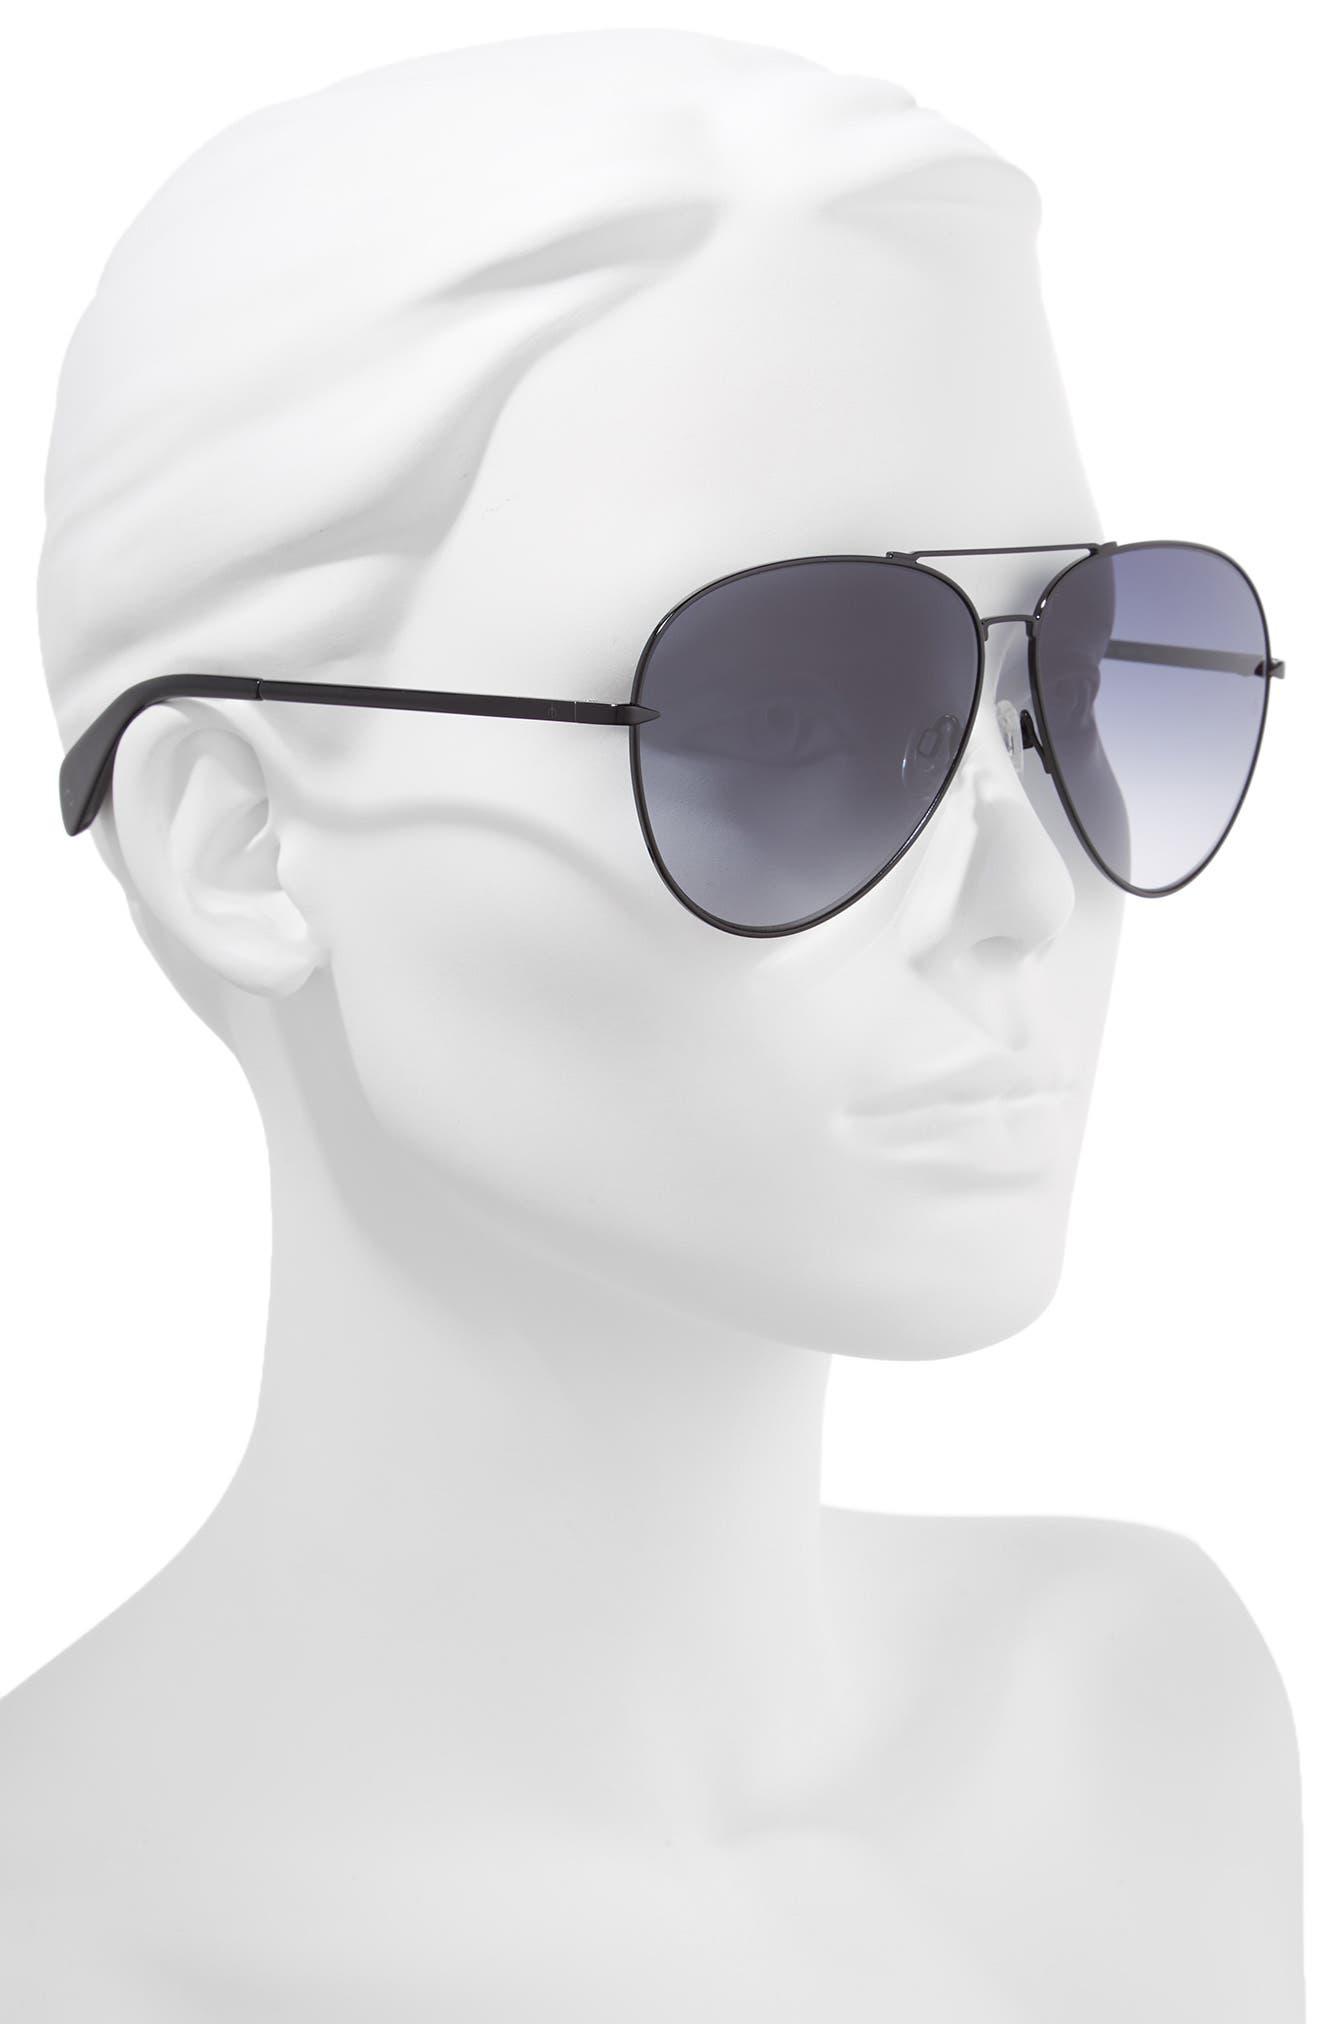 RAG & BONE, 63mm Oversize Aviator Sunglasses, Alternate thumbnail 2, color, BLACK